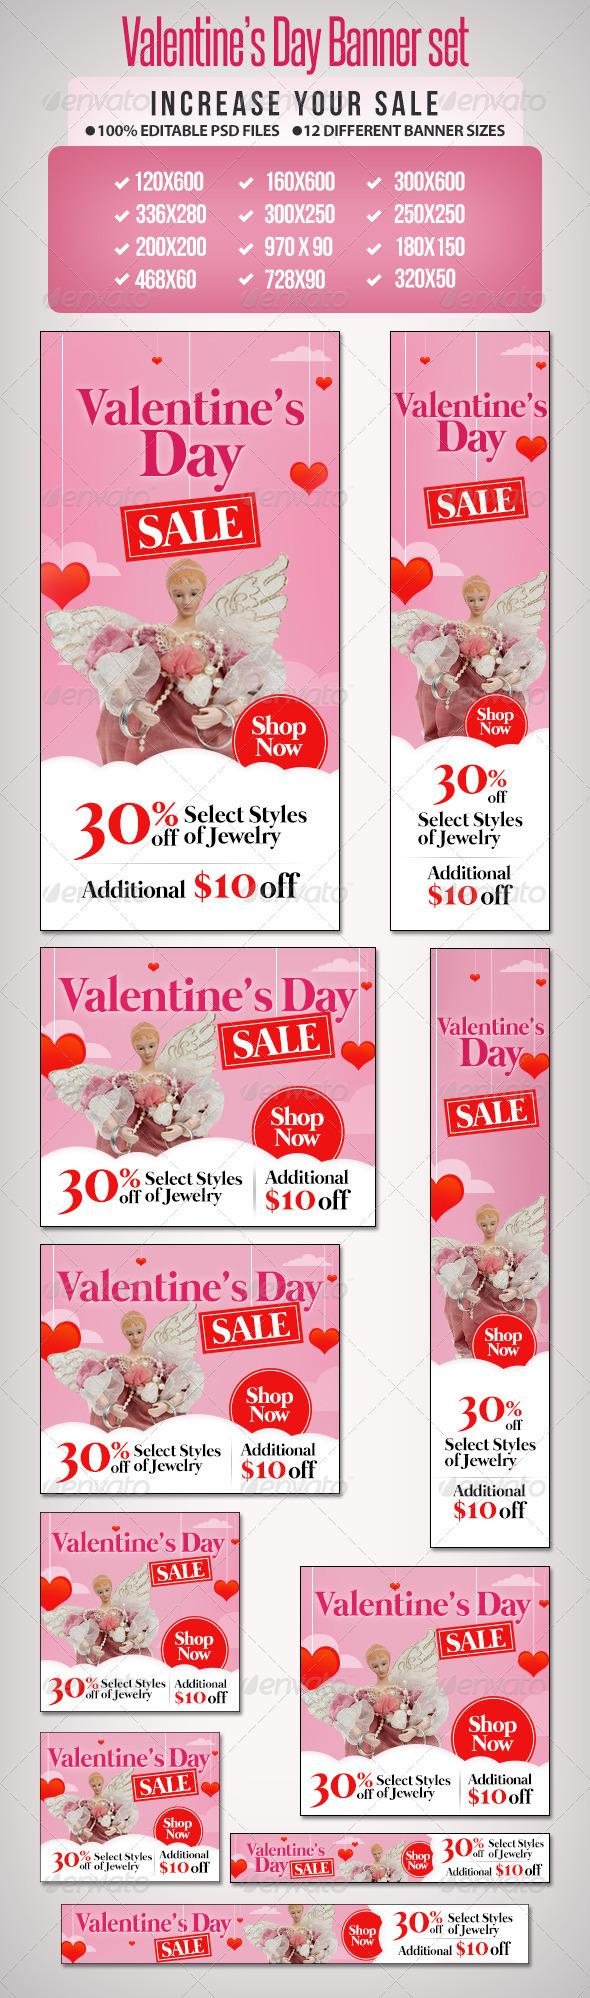 GraphicRiver Valentines Day Sale Banner Set 2 6588969